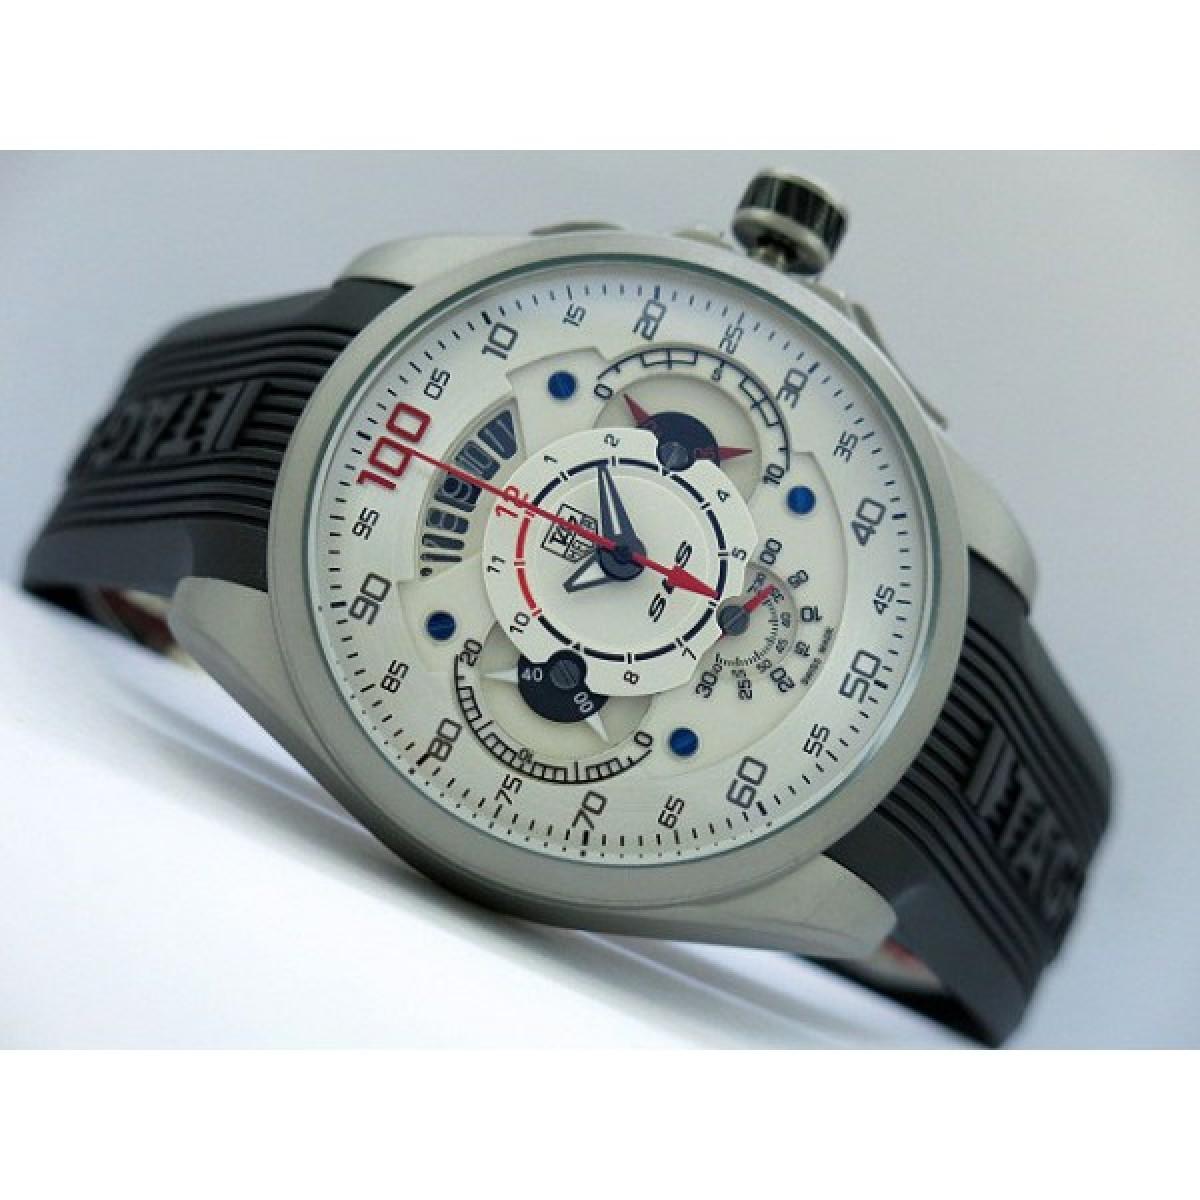 c97a2381491 Relógio Réplica Tag Heuer Carrera Mercedez Slr